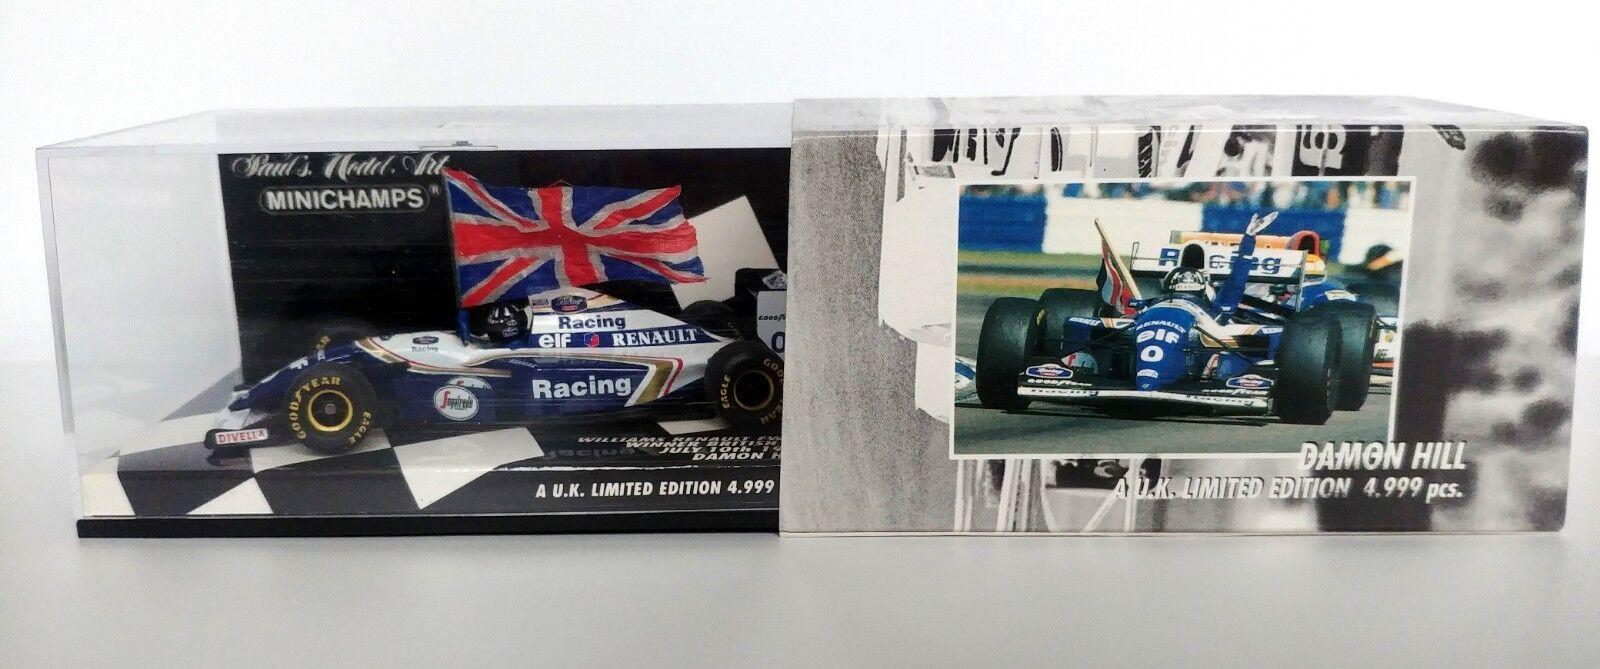 1 43 Damon HILL WILLIAMS RENAULT FW16 1994 British Grand Prix Winner MINICHAMPS